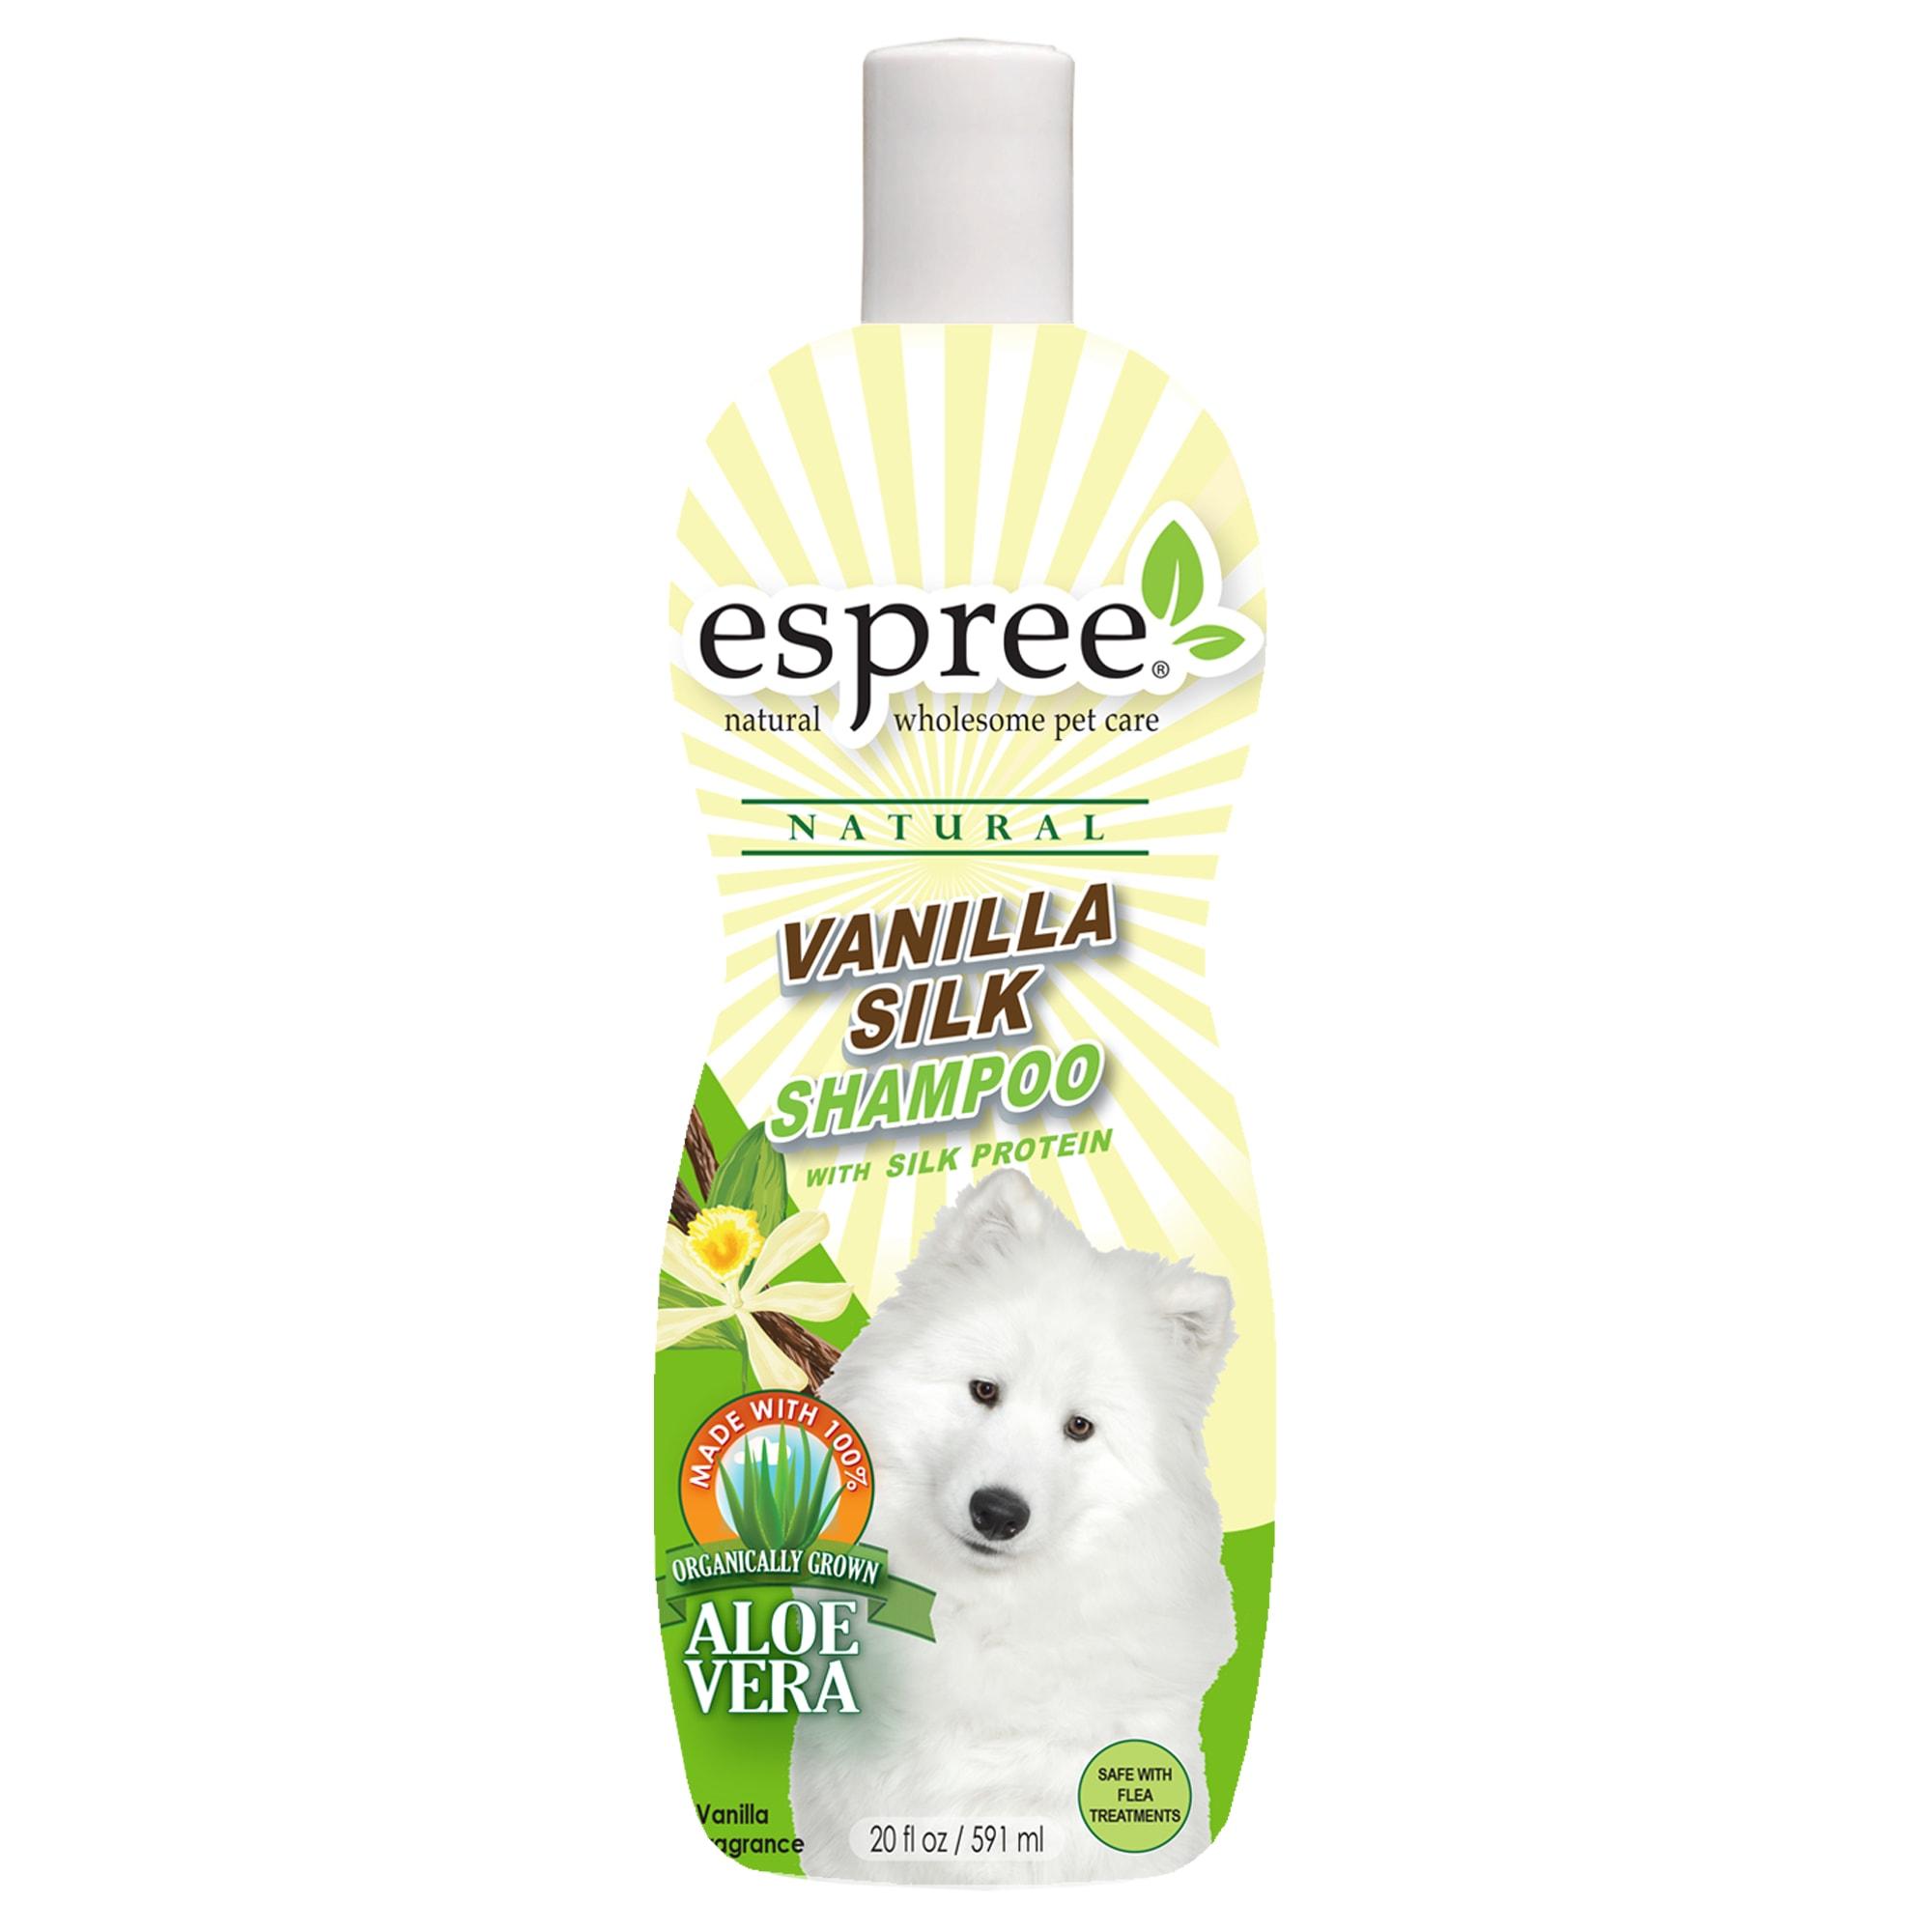 Espree Vanilla Silk Shampoo 20 Fl Oz Petco